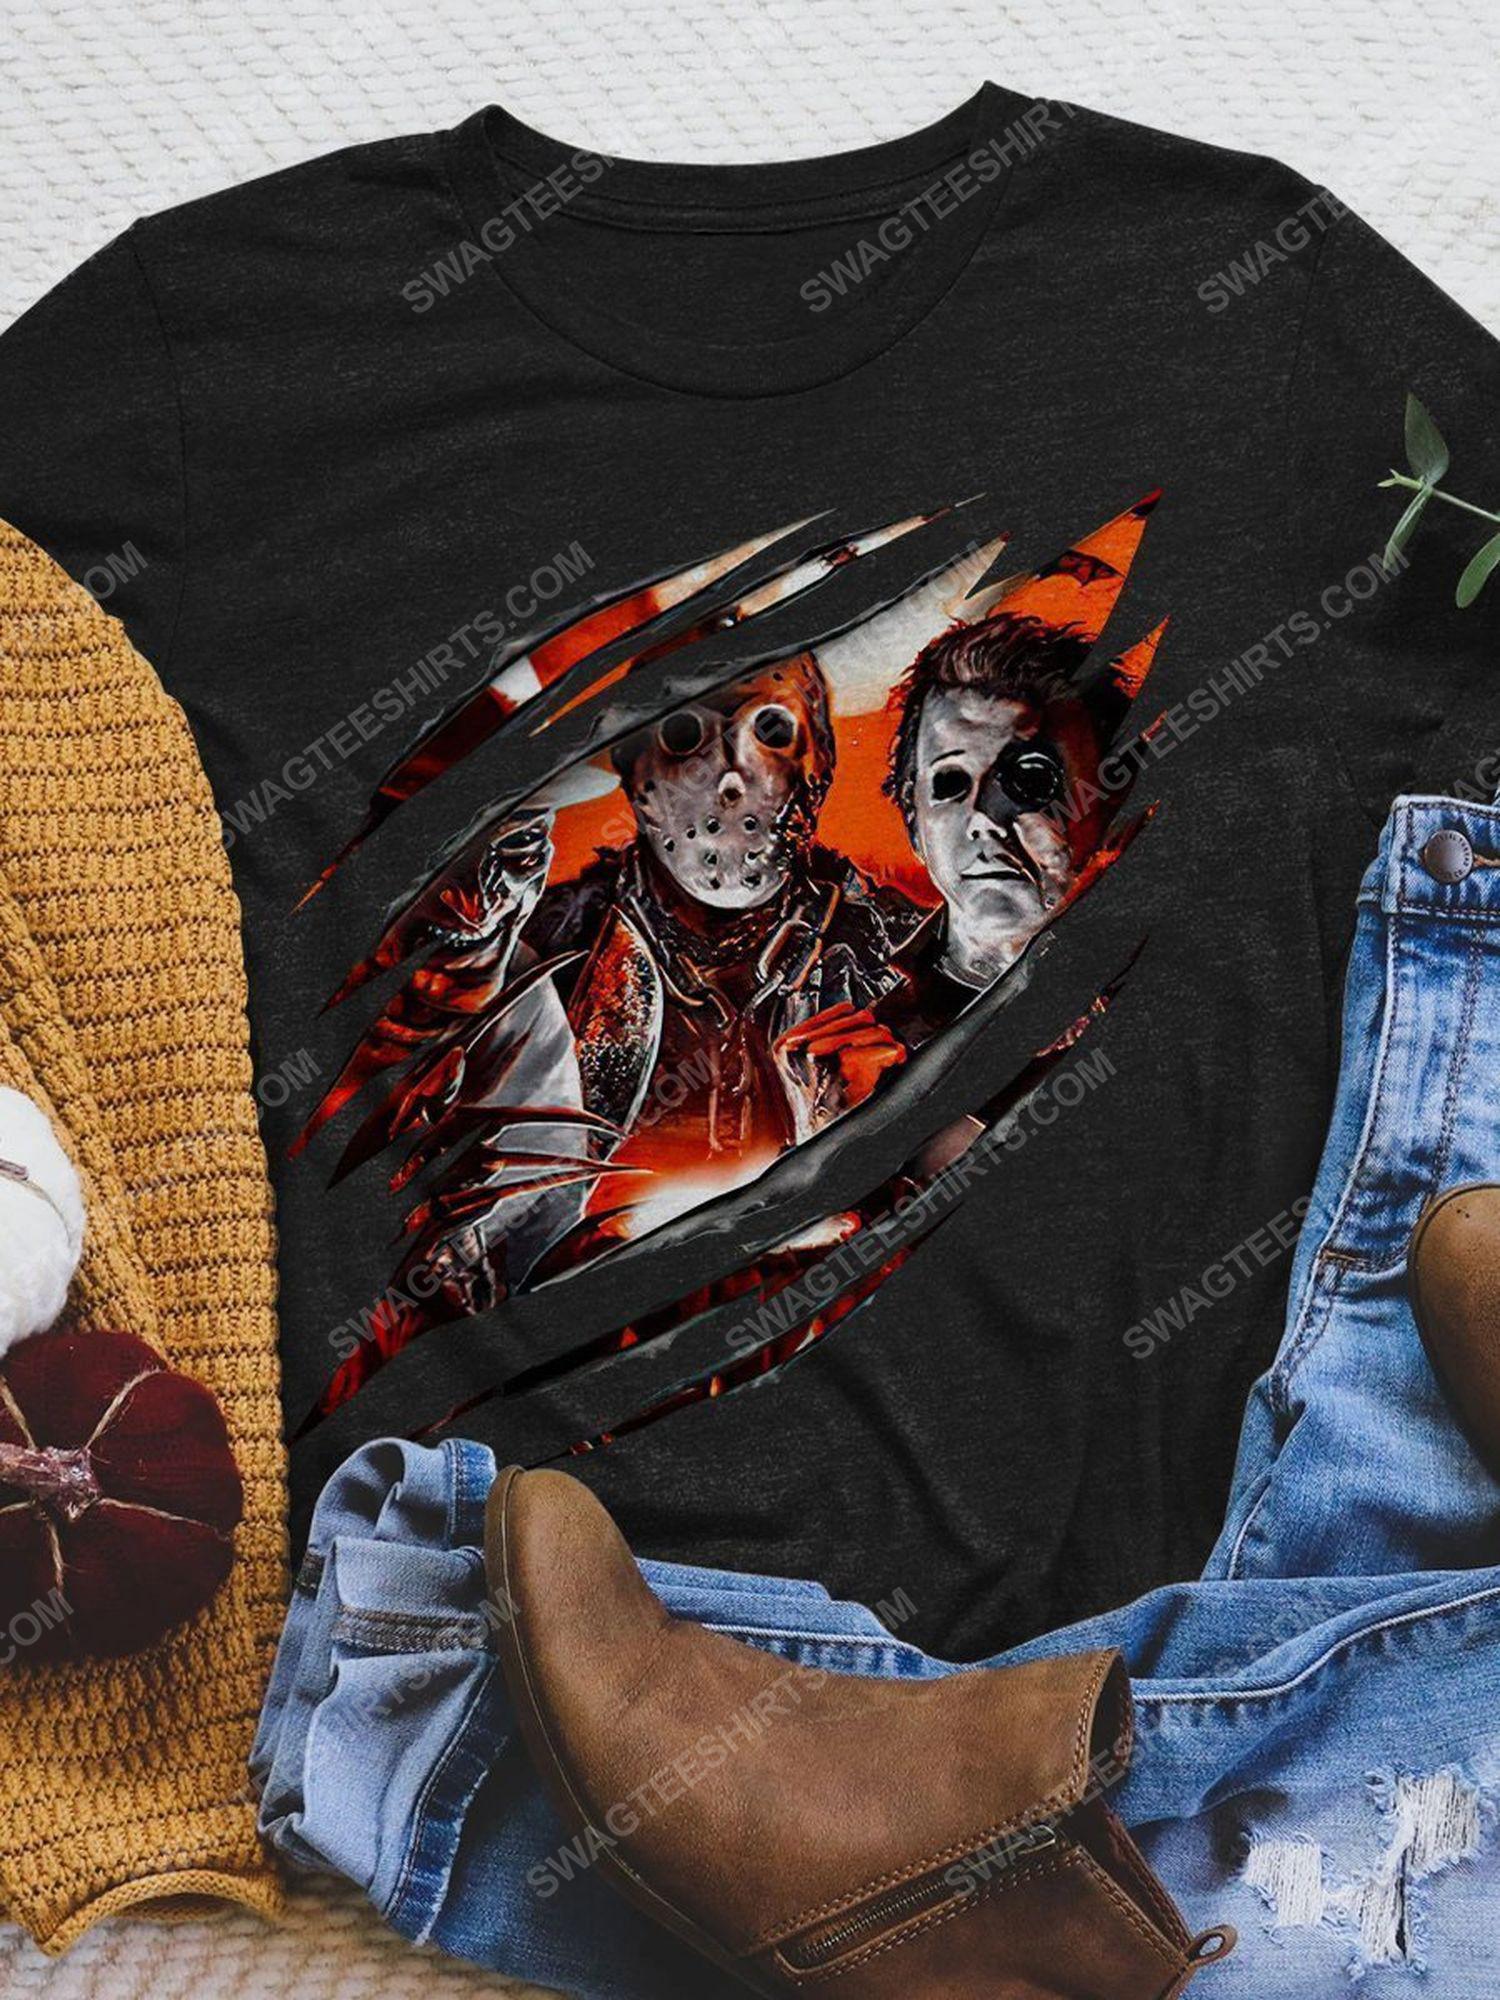 Halloween michael myers jason voorhees and freddy krueger shirt 1 - Copy (3)